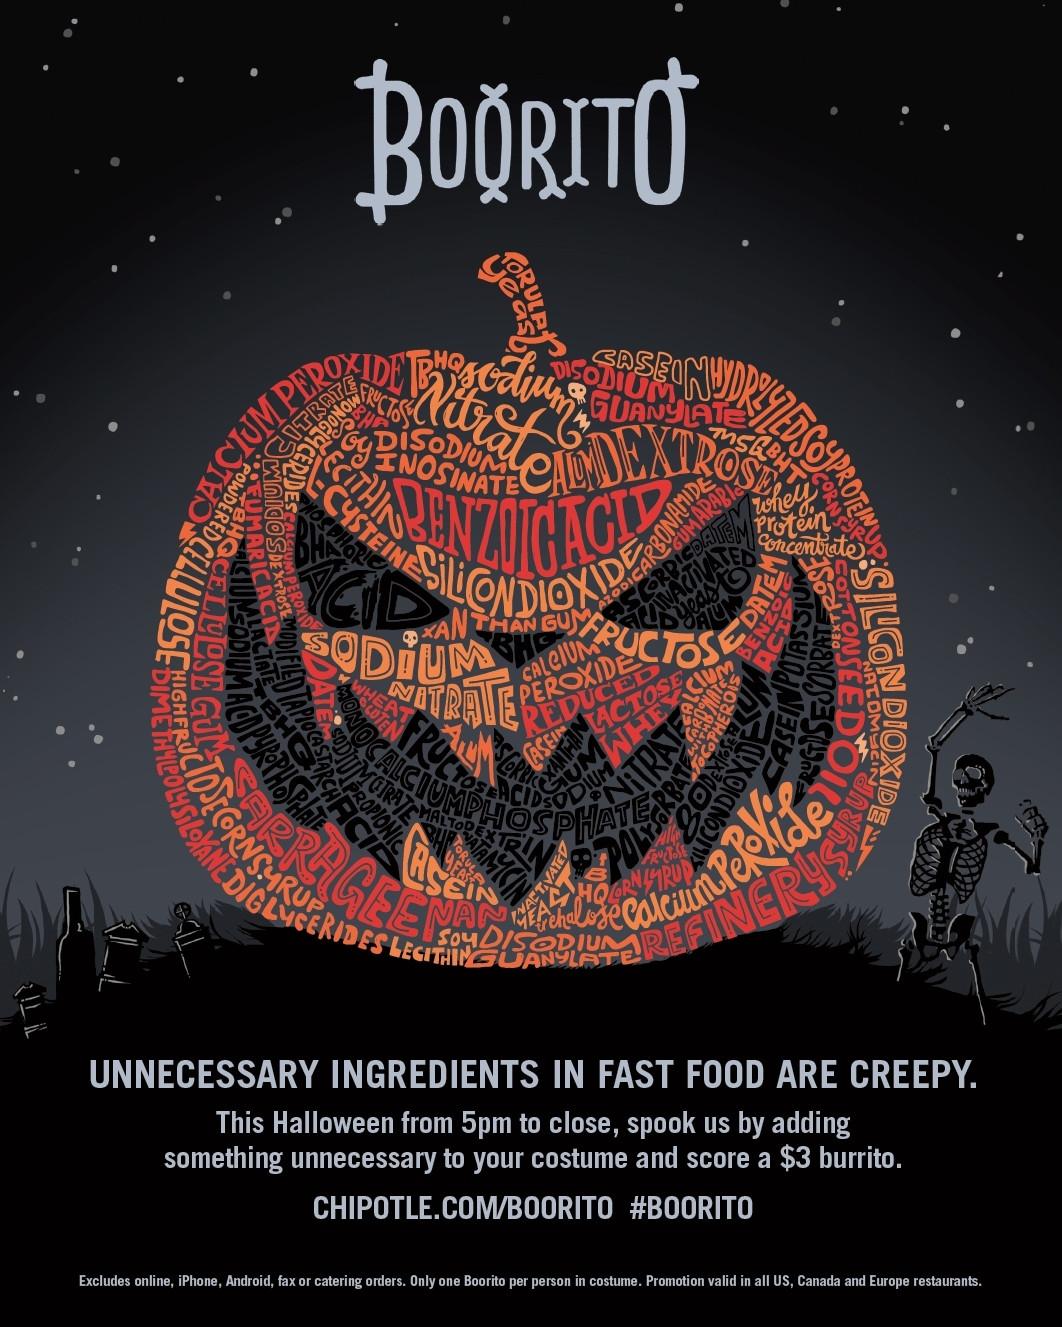 Chipotle 3 Dollar Burritos Halloween  Chipotle $3 Burrito on Halloween The Coupon Project